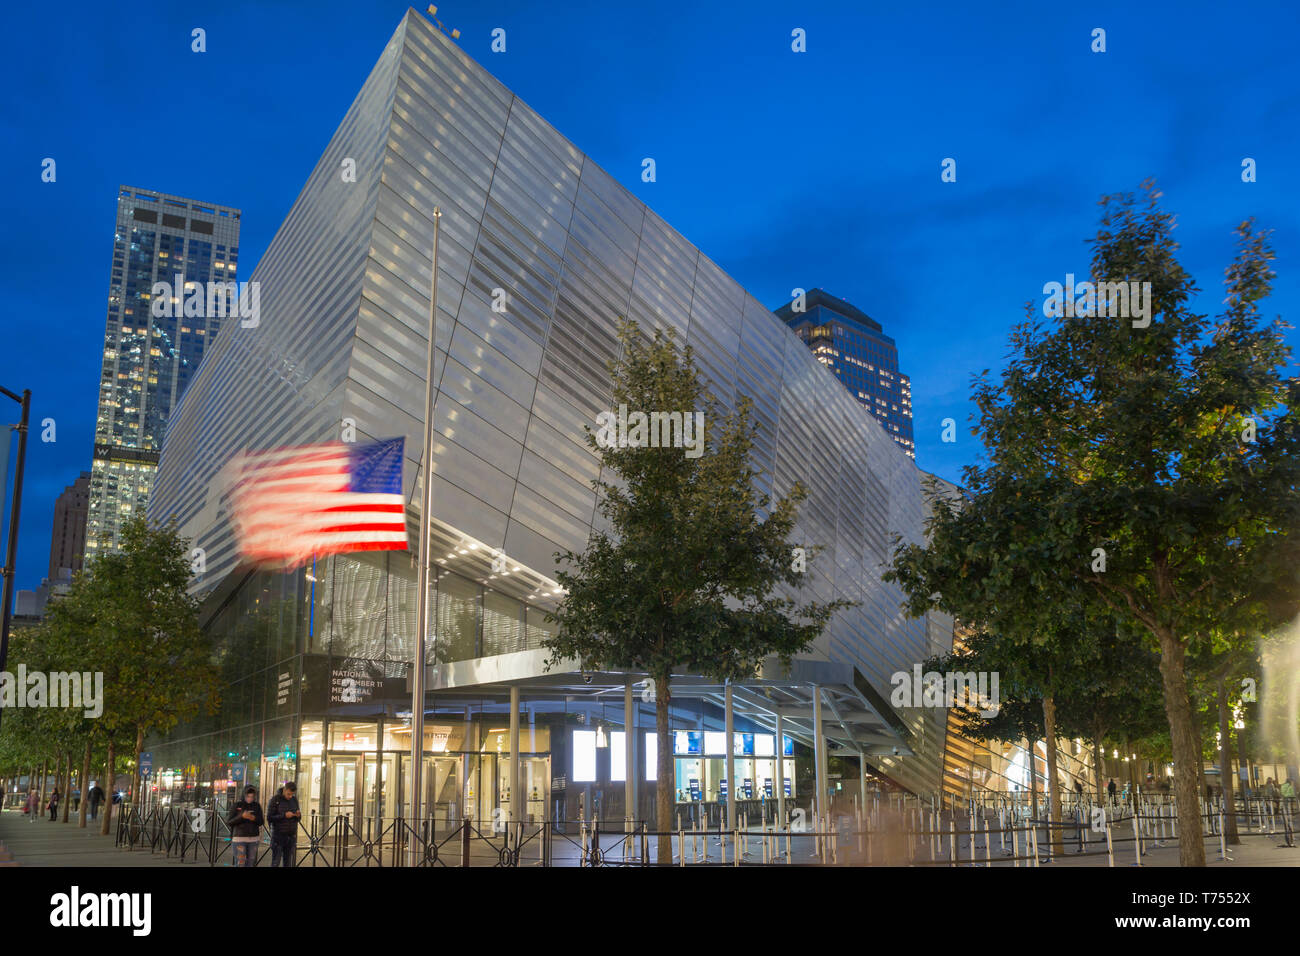 ENTRANCE PAVILION NATIONAL SEPTEMBER 11 MEMORIAL MUSEUM (©DAVIS BRODY BOND 2018 ) DOWNTOWN MANHATTAN NEW YORK CITY USA Stock Photo